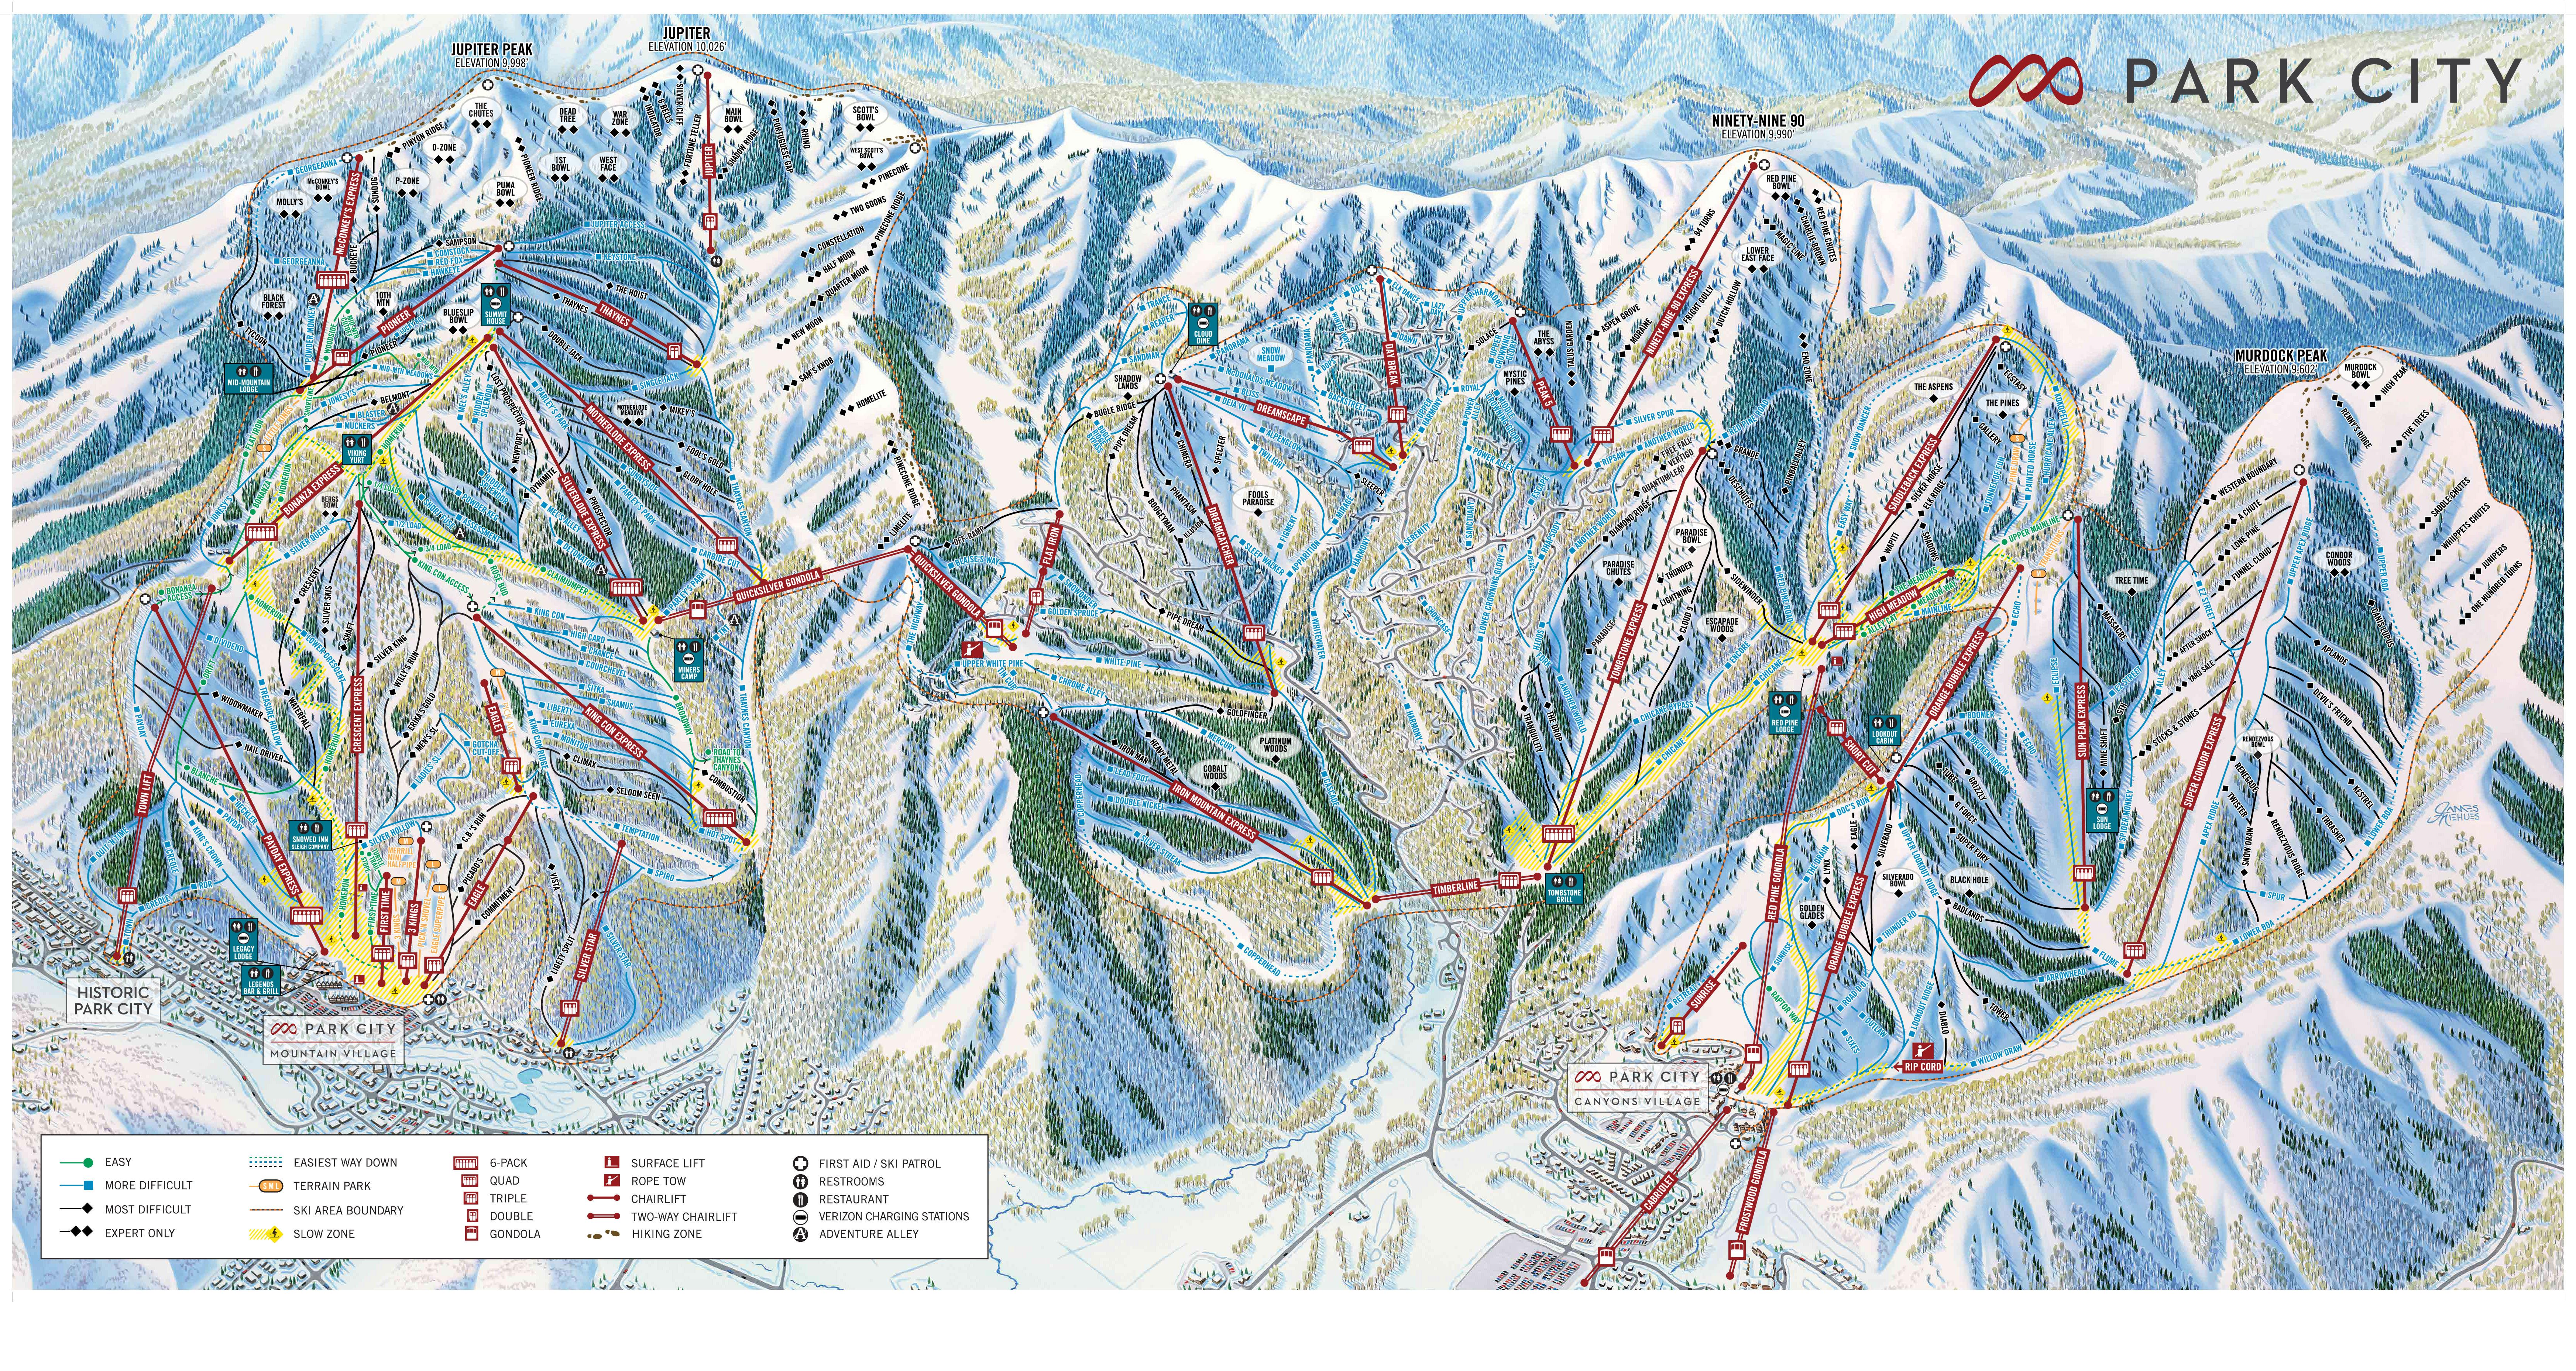 Southern California Ski Resorts Map Best Of Park City Ski Resorts - Southern California Ski Resorts Map